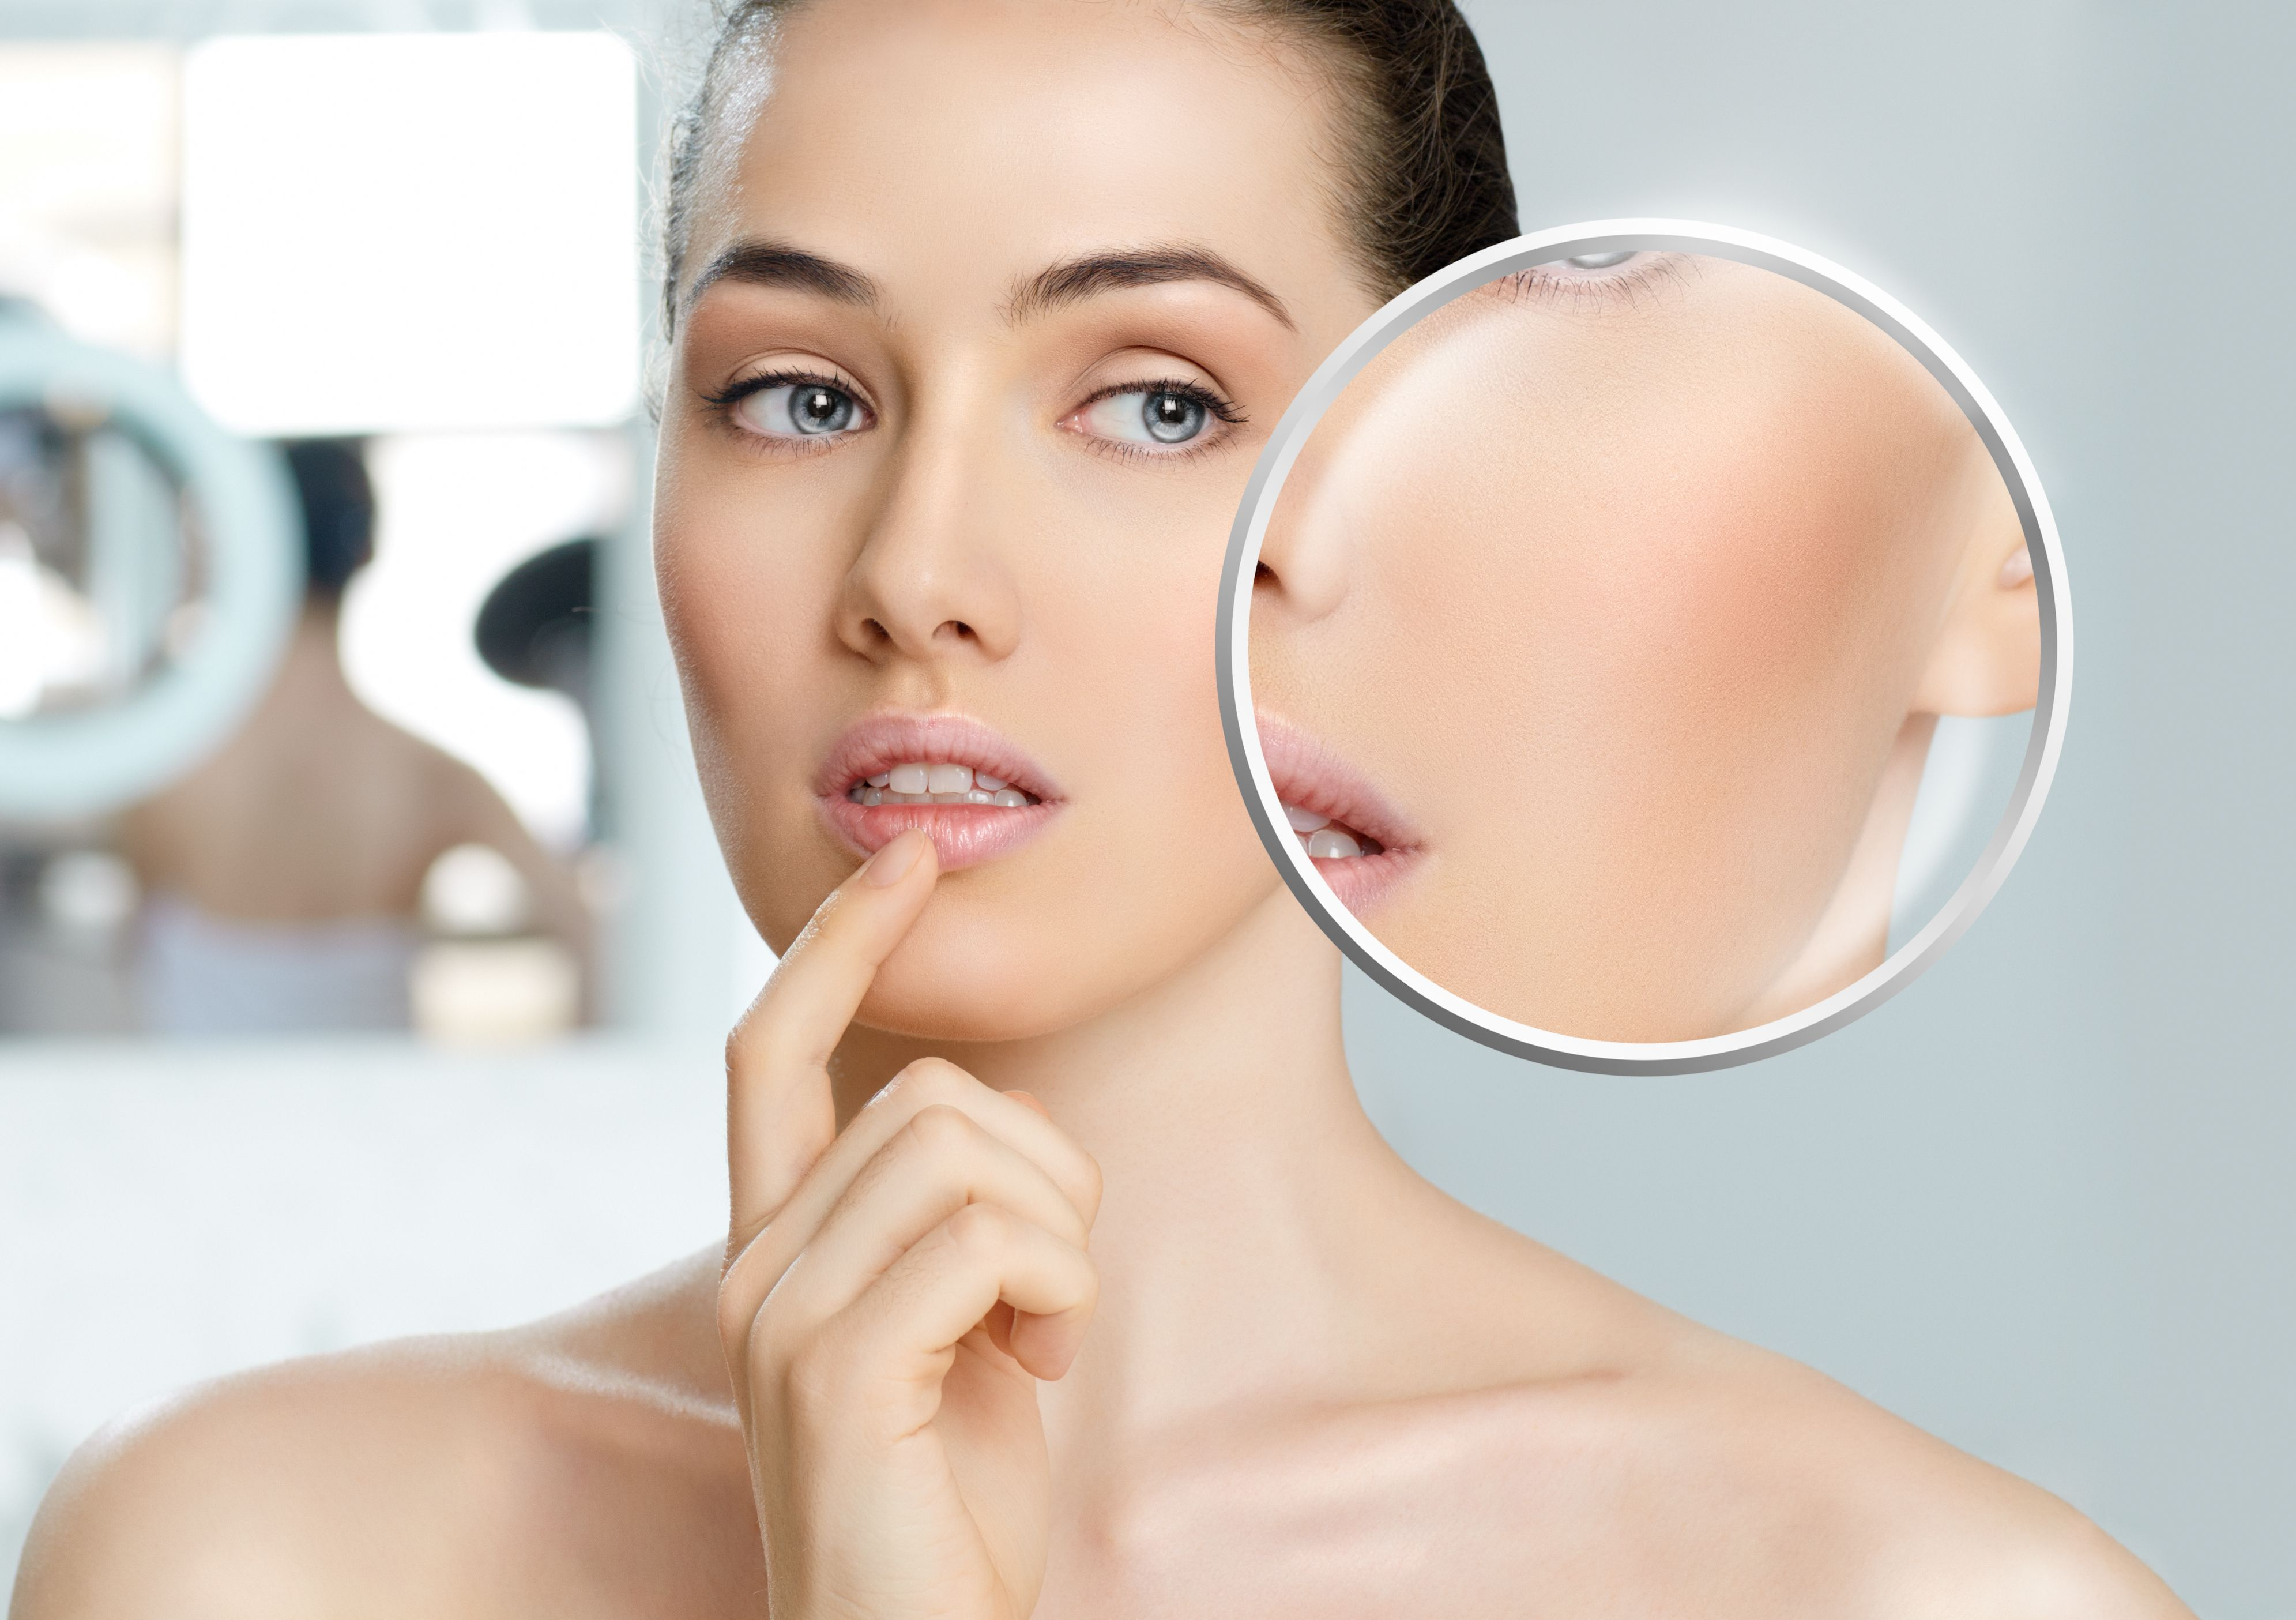 Piel deshidratada. Arrugas finas: Tratamientos de Centro Médico Estético Asuar